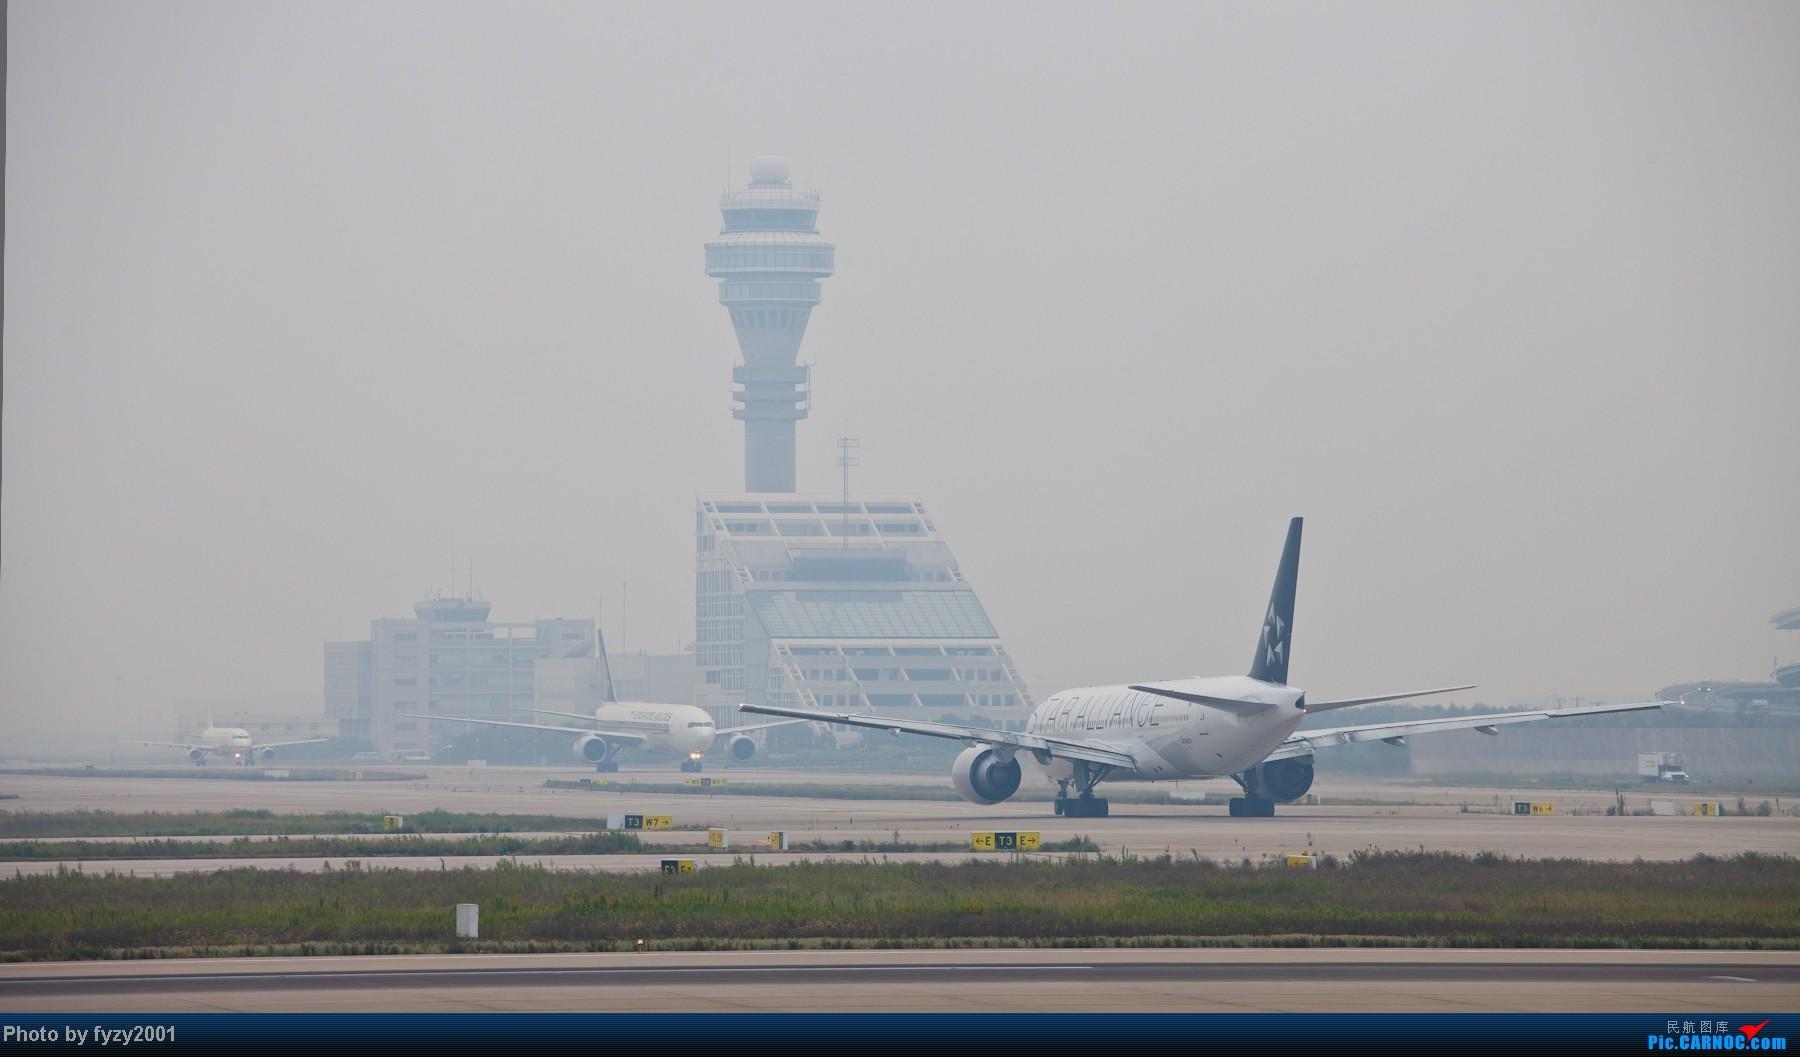 Re:[原创][无锡西站]长假PVG蹲守~~~~只发大图,多图杀猫~~~~ BOEING 777-200ER N76021 中国上海浦东机场